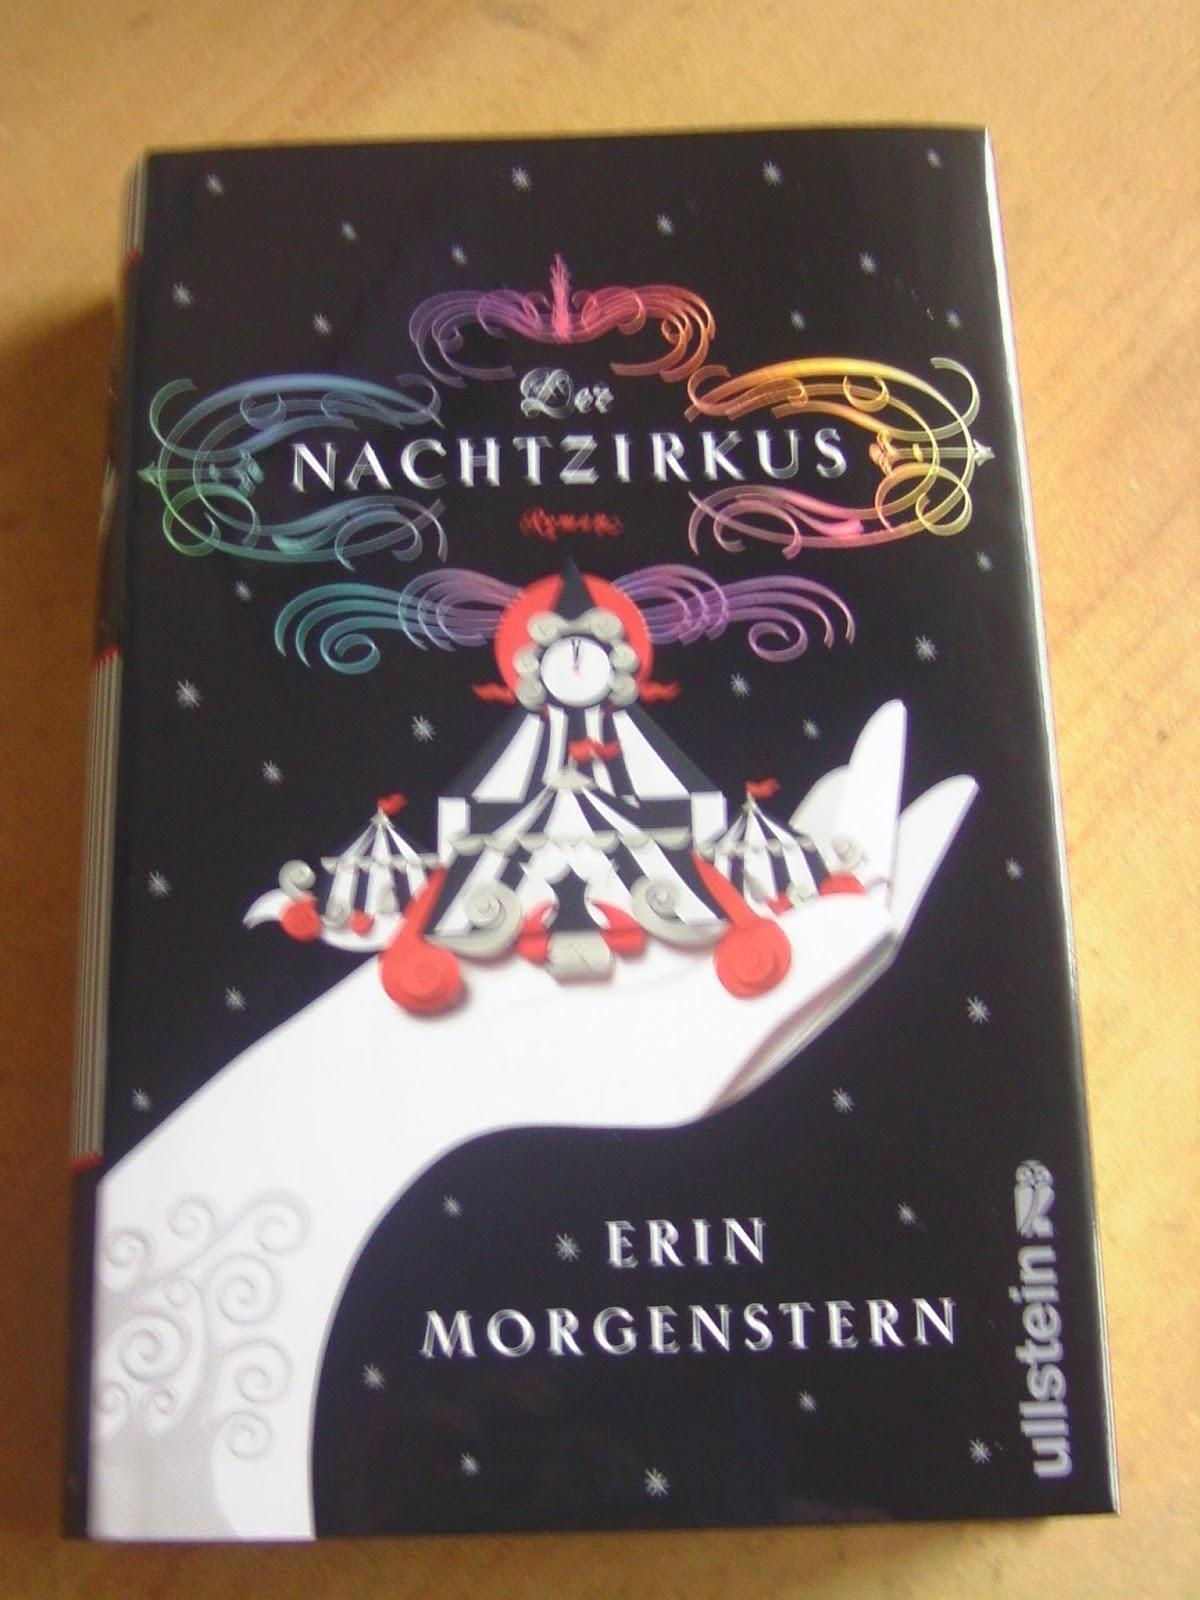 http://www.amazon.de/Nachtzirkus-Roman-Erin-Morgenstern/dp/354828549X/ref=sr_1_1?ie=UTF8&qid=1429121069&sr=8-1&keywords=der+nachtzirkus